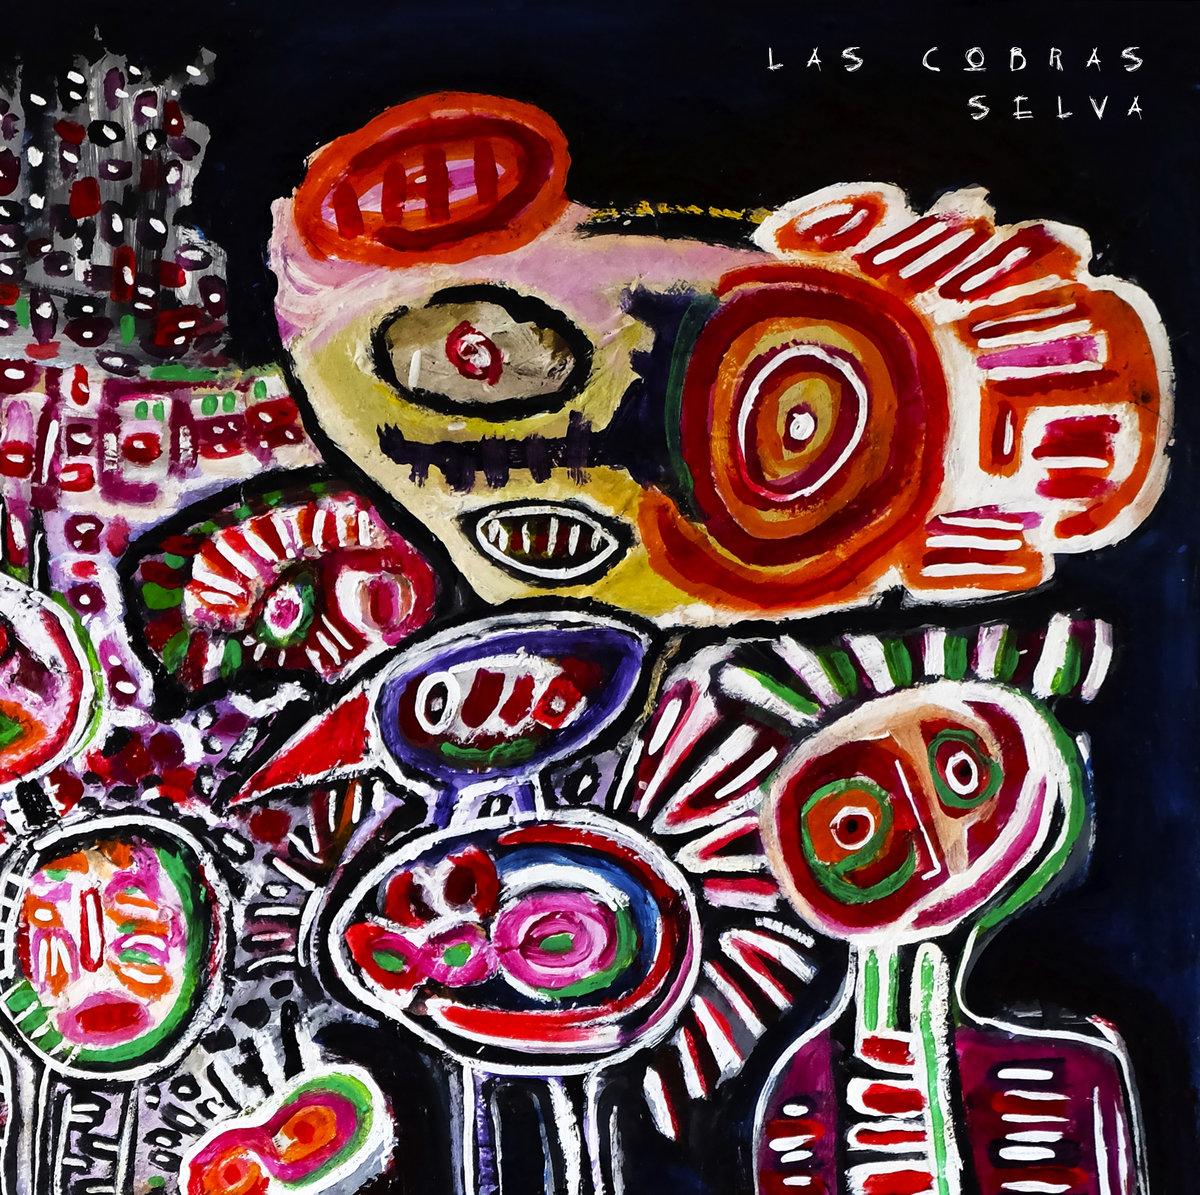 Las Cobras – Selva (2020)